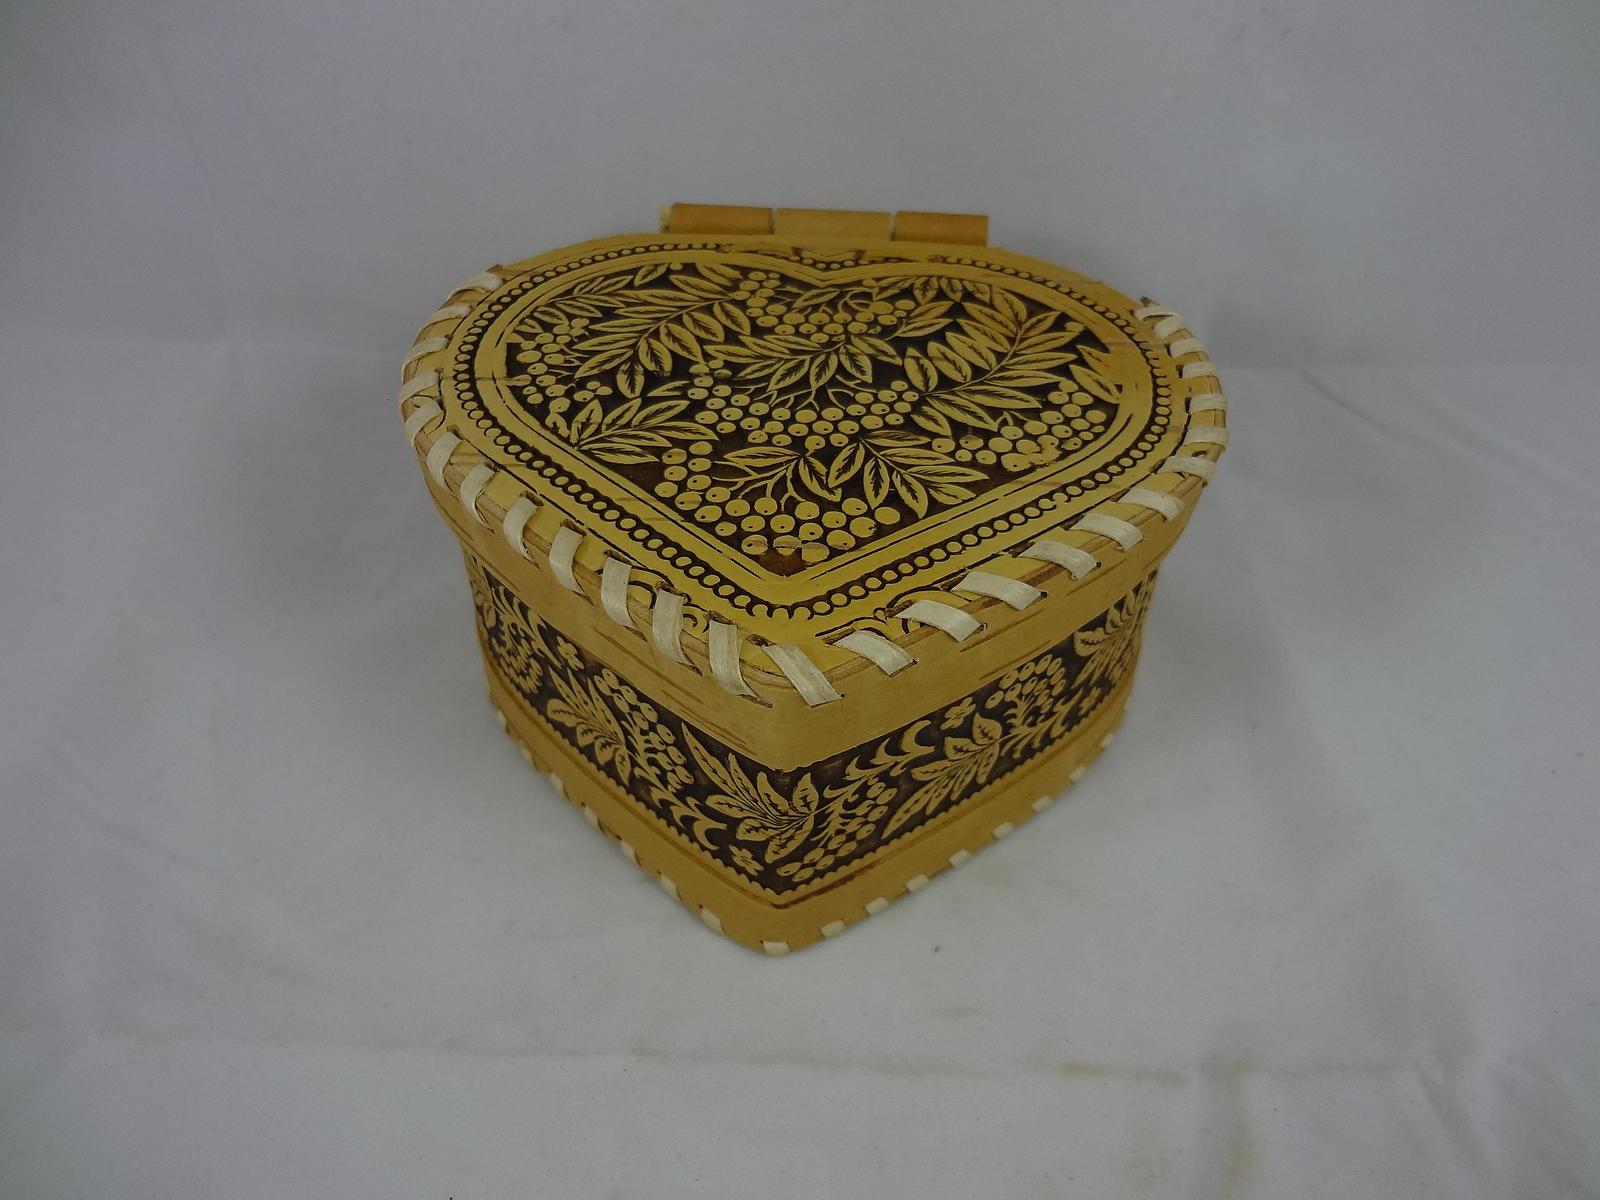 Сувенир МЕДВЕЖОНОК 5,5*9,5 см керамика